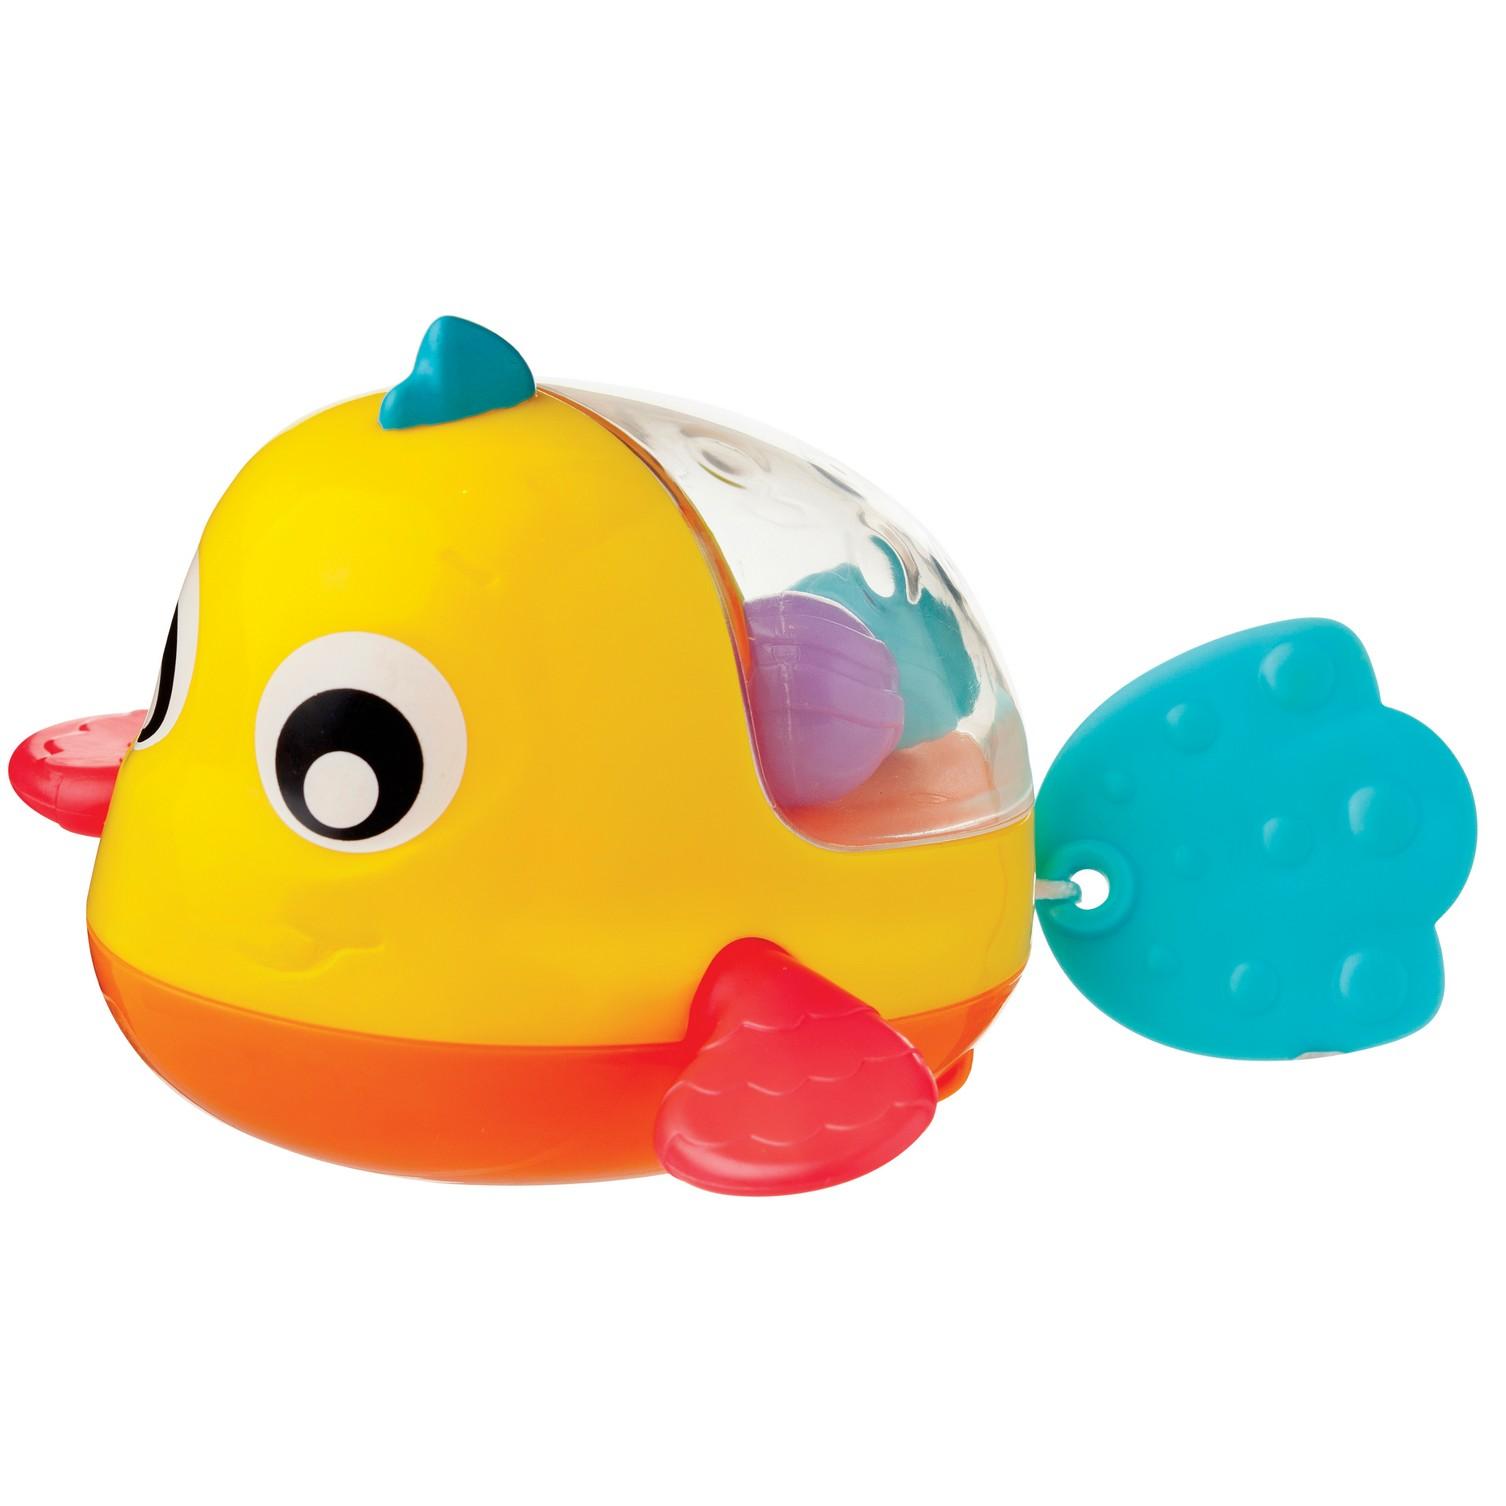 Playgro   Playgro Padding Bath Fish Multicolor